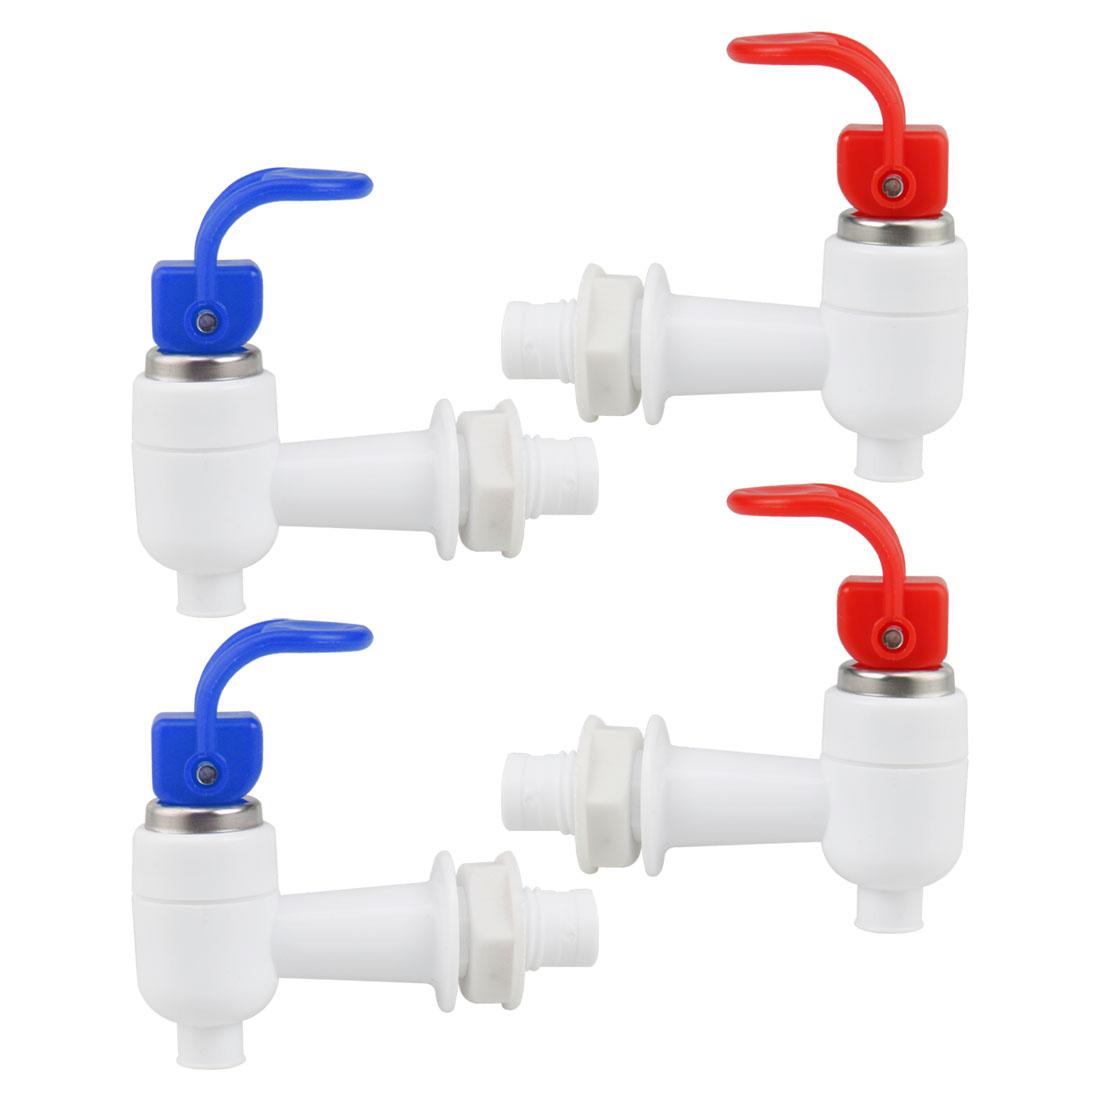 Assorted Color Plastic Water Cooler Hot Cold Home Faucet Spigot Replacement 4pcs